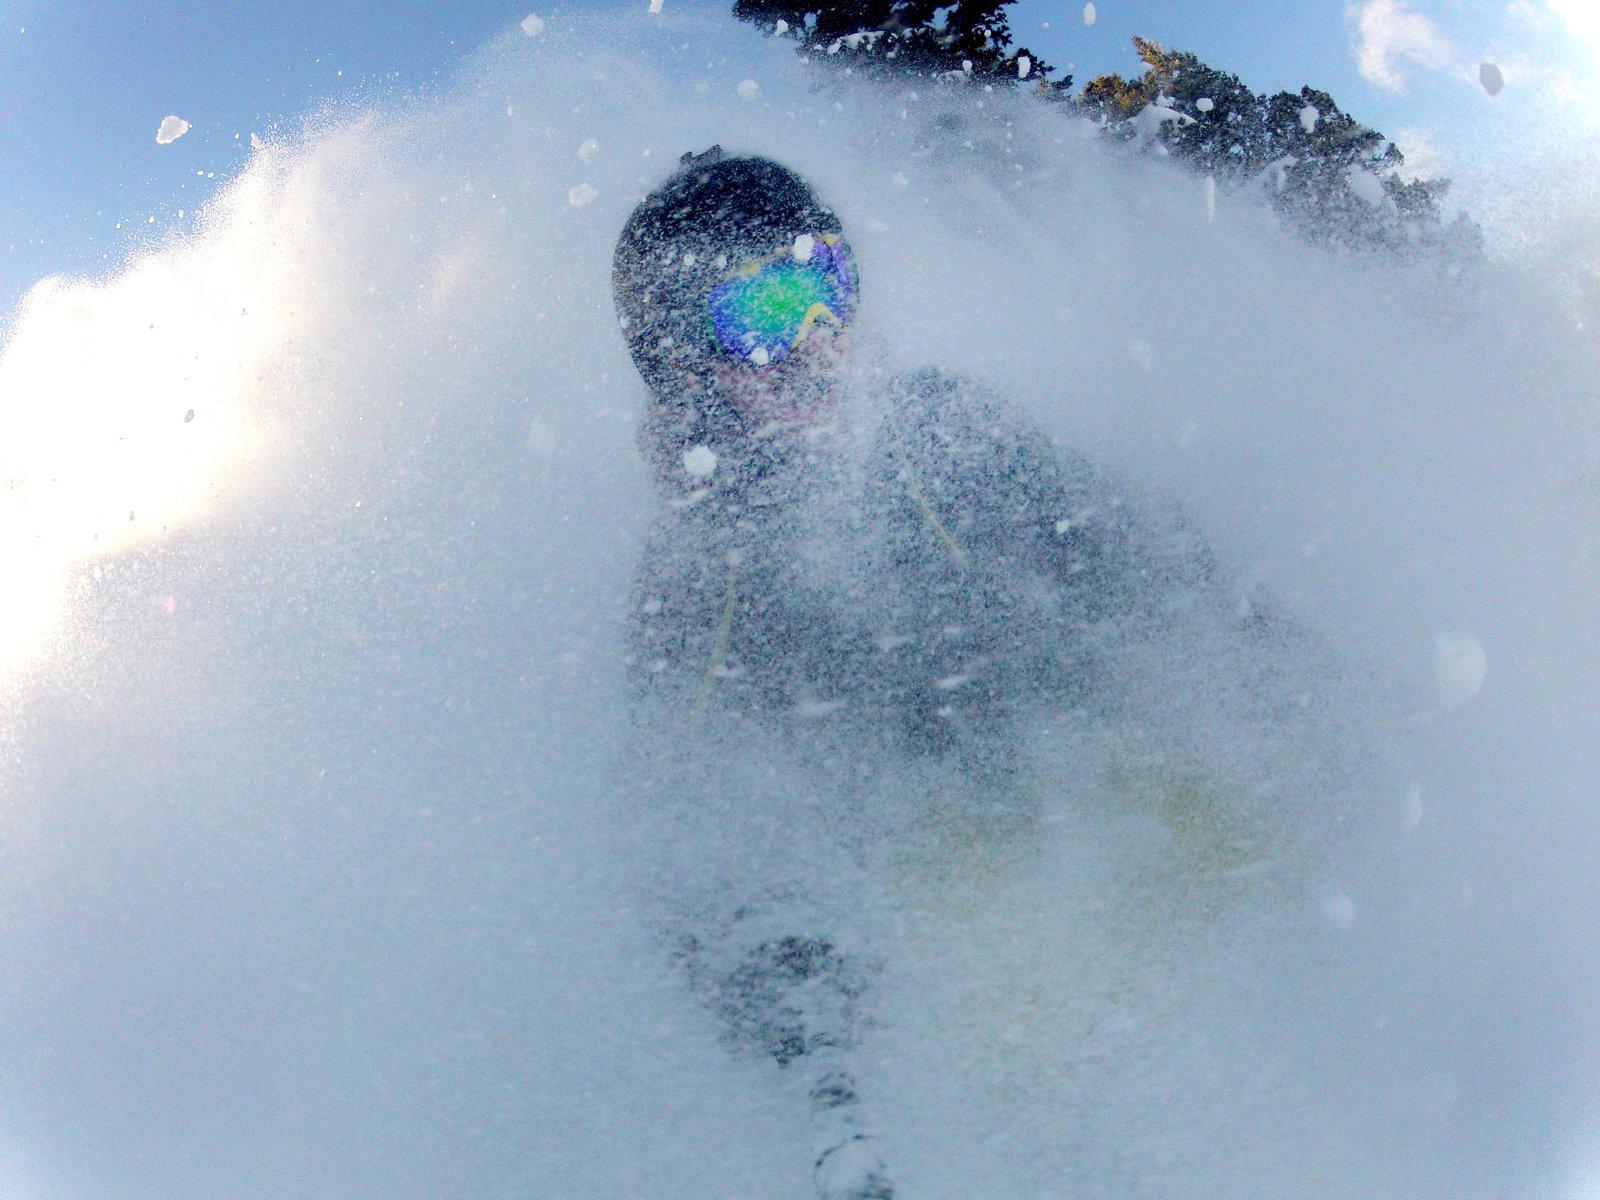 Snowbasin Pow Day